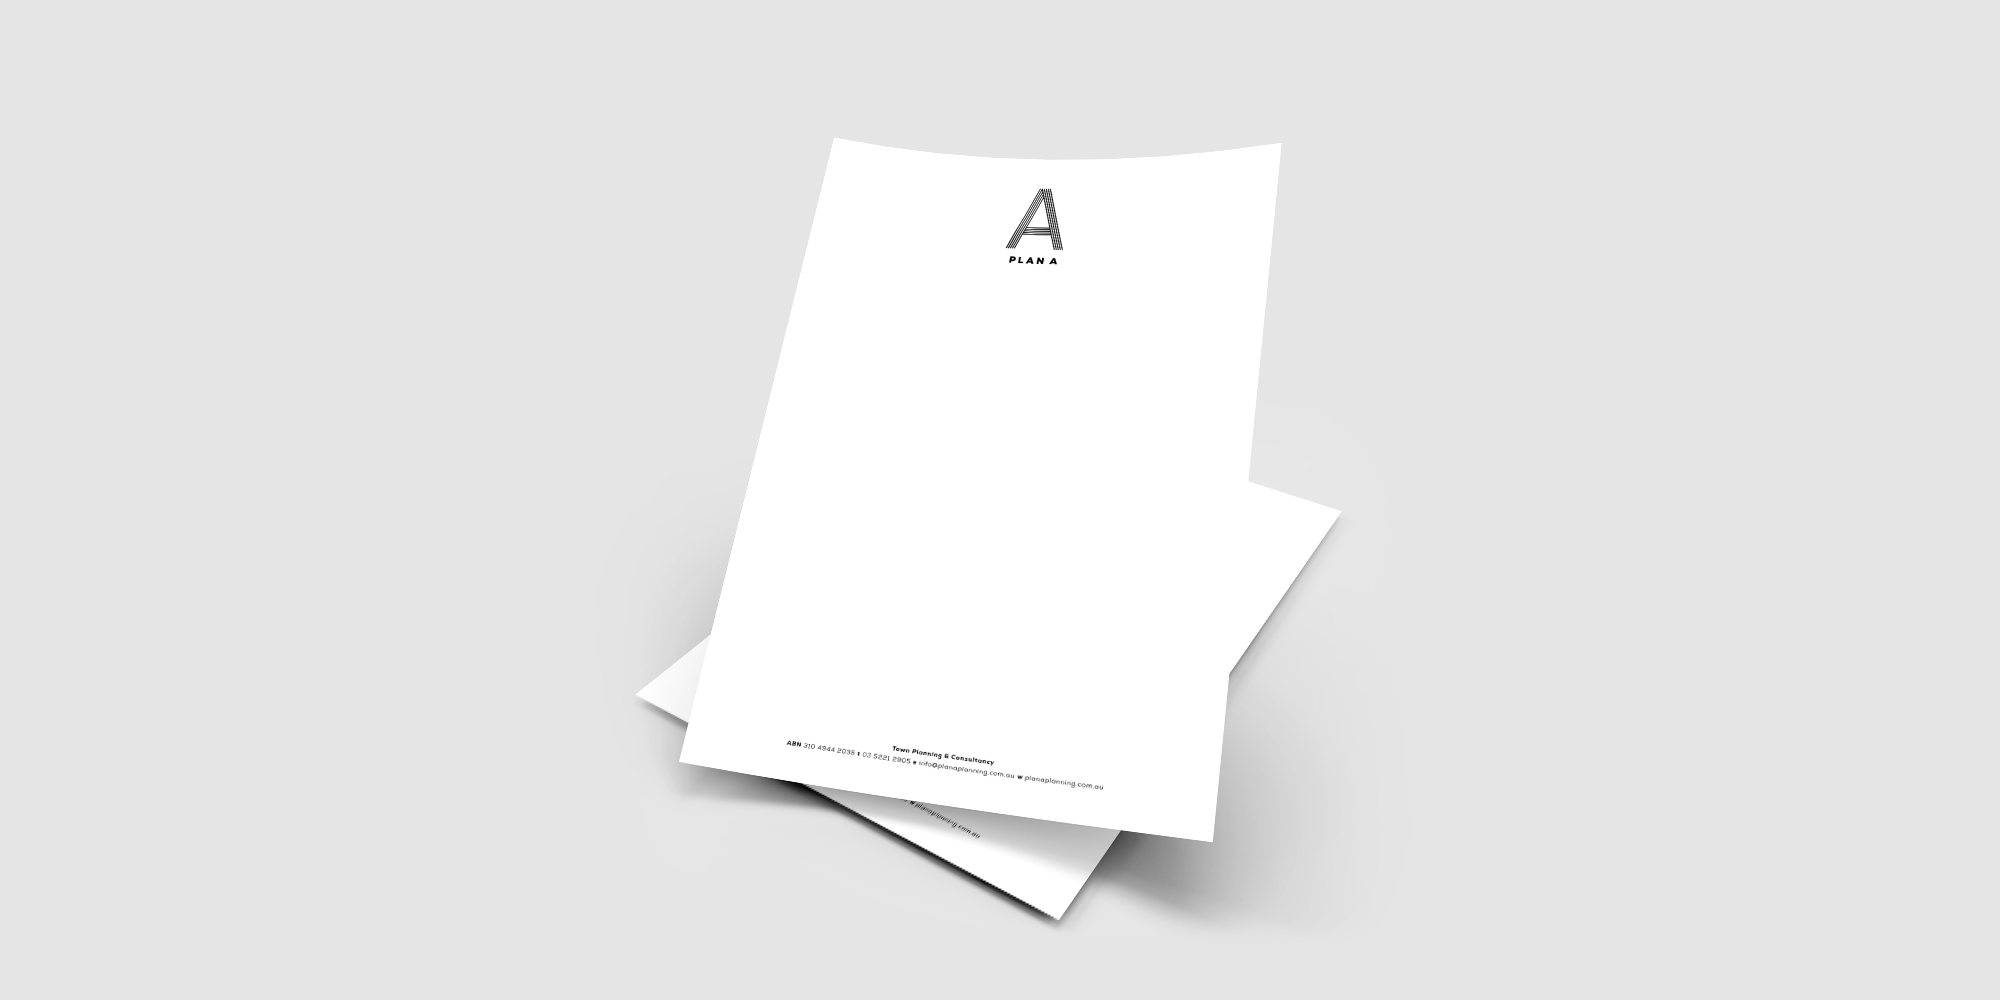 Plan A Planning Letterhead